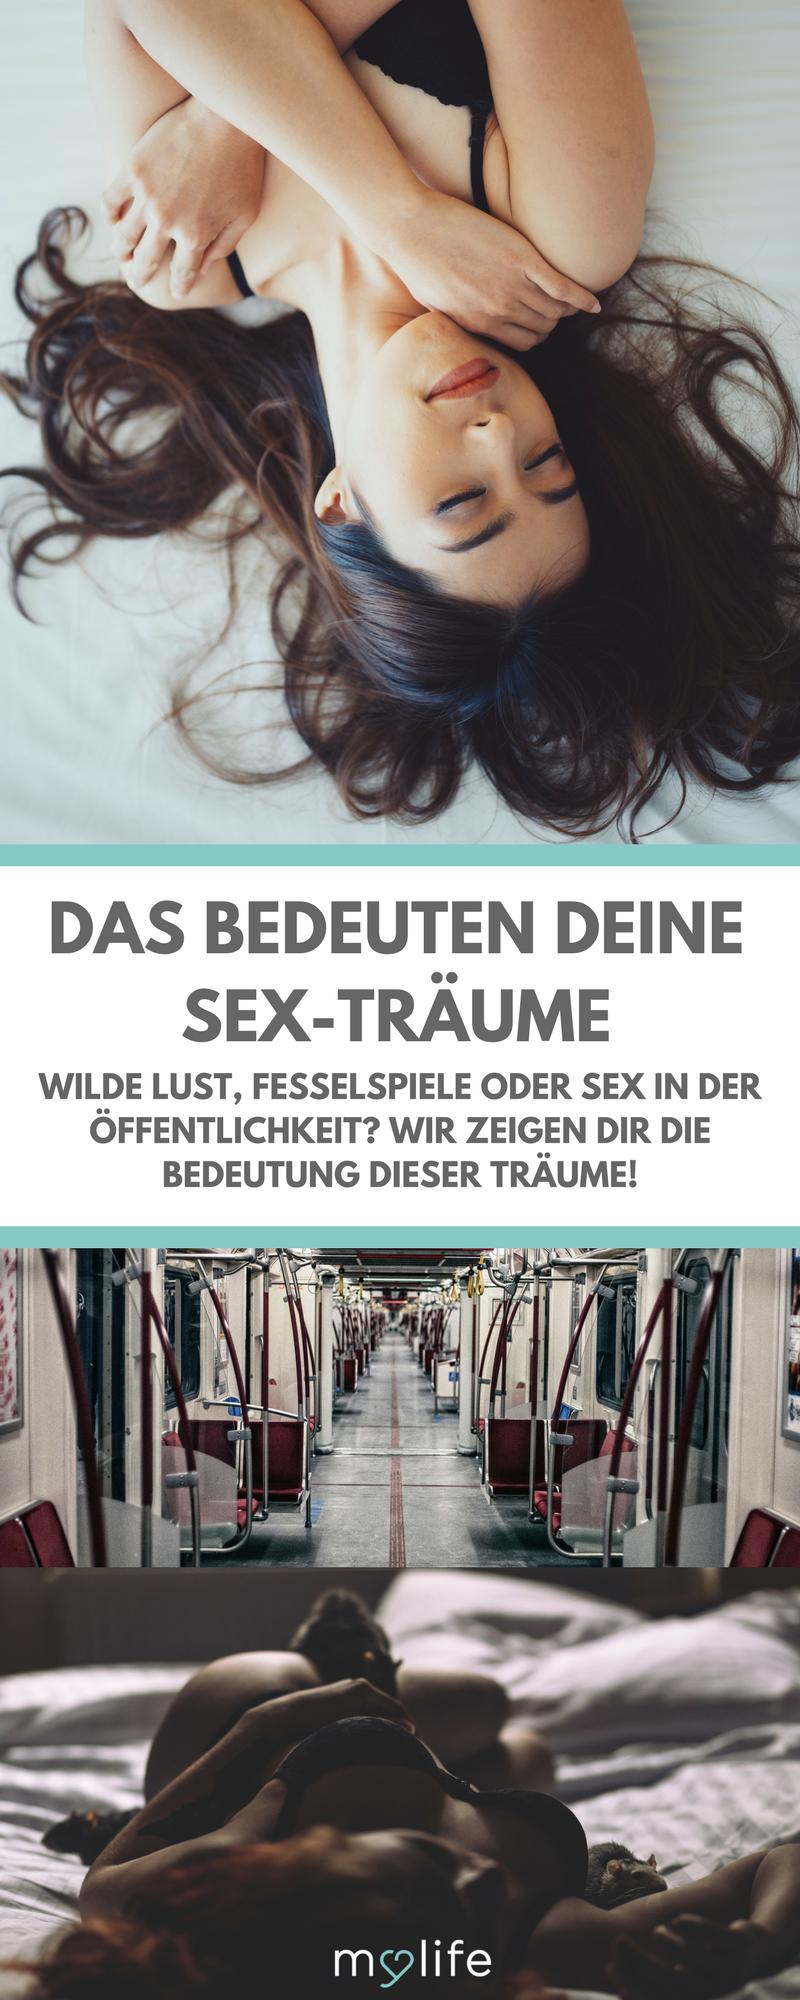 Funny, very social, BBW Frau masturbiert in der Küche (Versteckte Kamera) love lick and ride